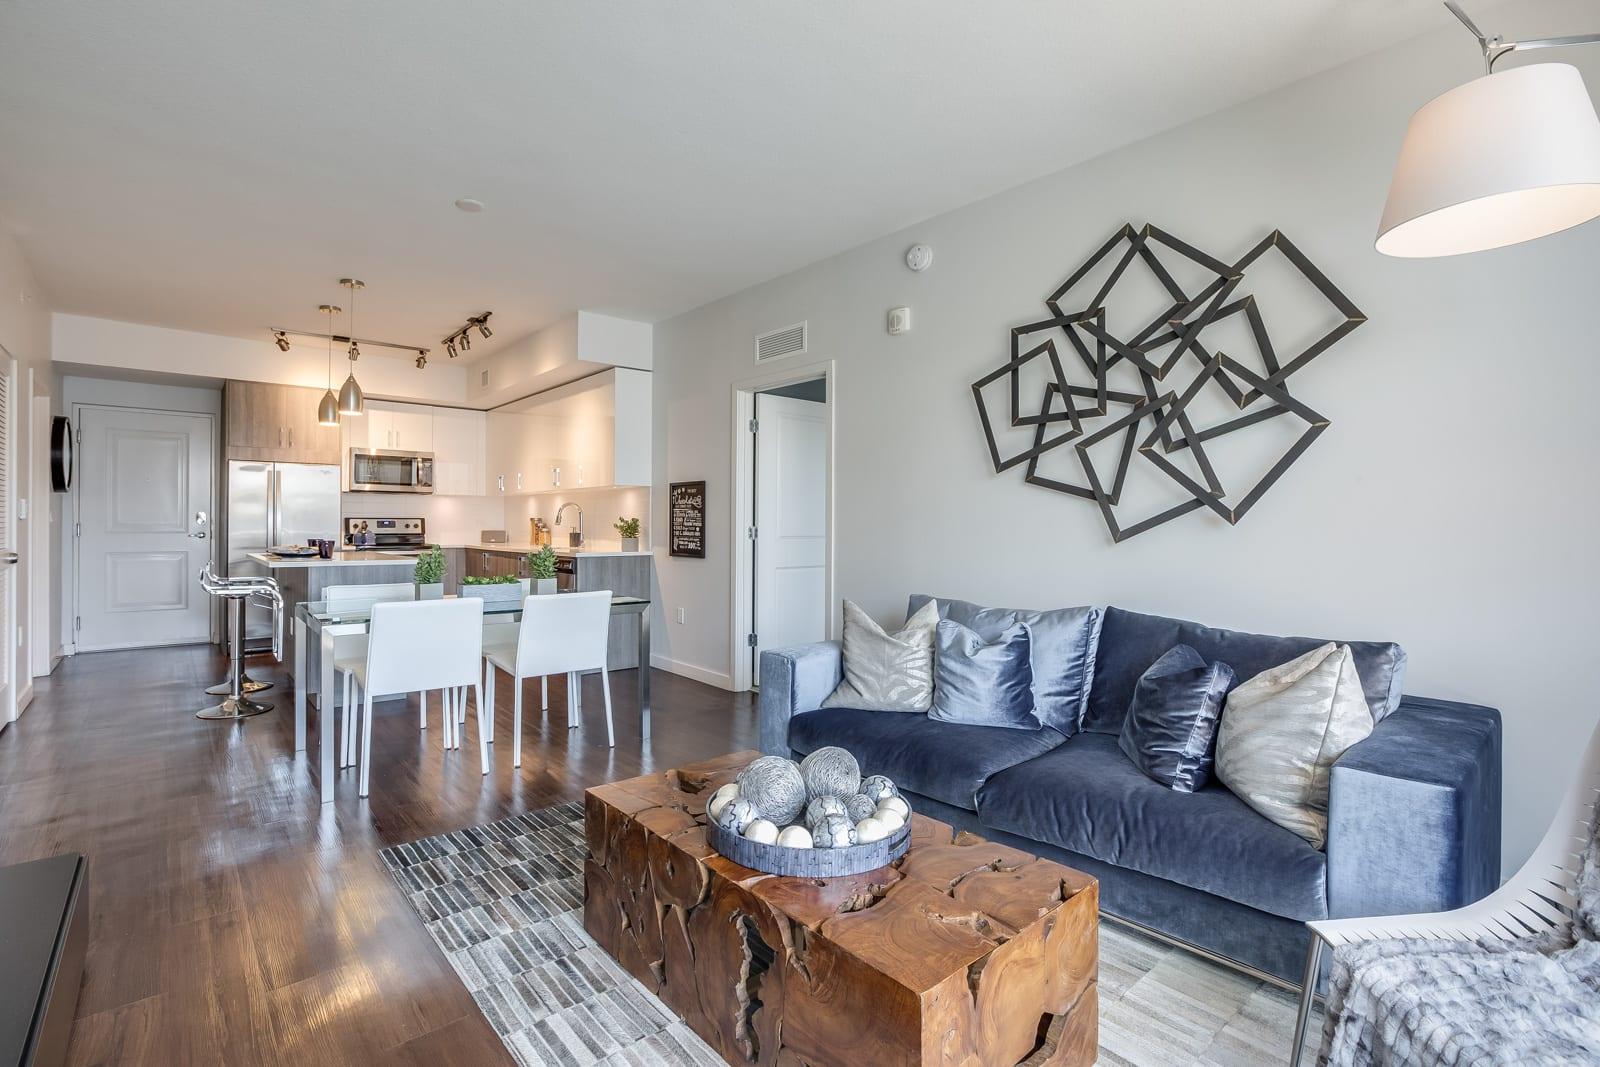 Luxurious Apartment Interiors  at Allure by Windsor, 6750 Congress Avenue, Boca Raton